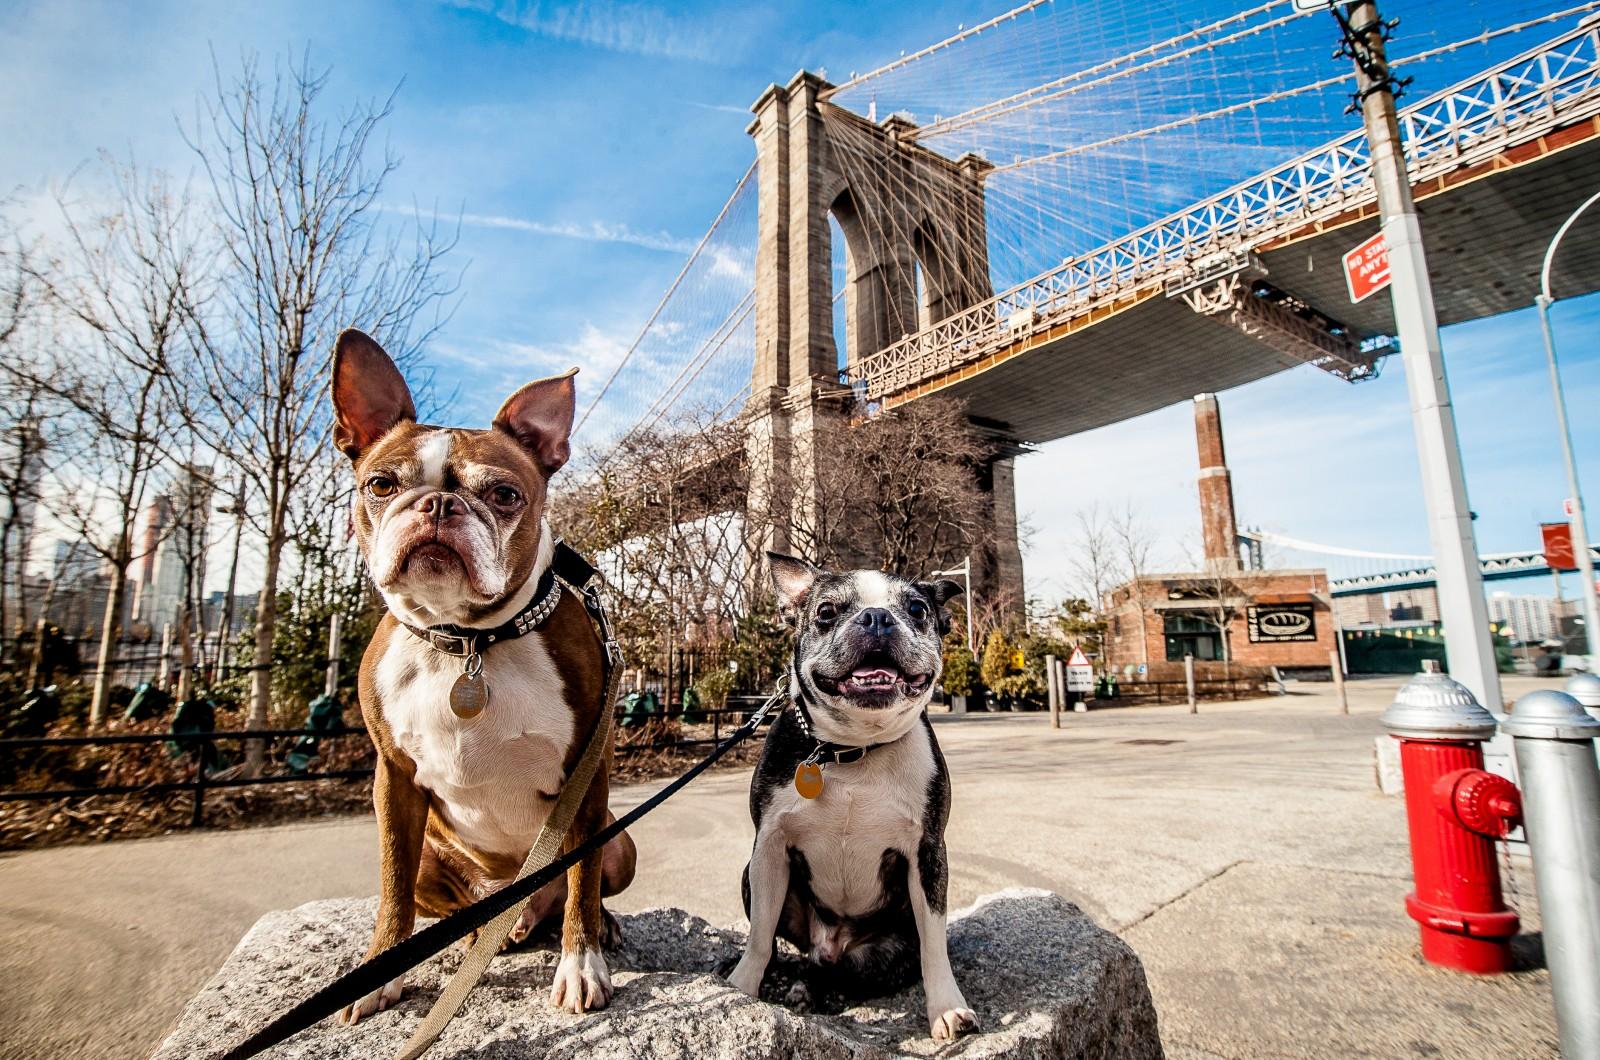 NYC's Most Dog-Friendly Neighborhoods | StreetEasy